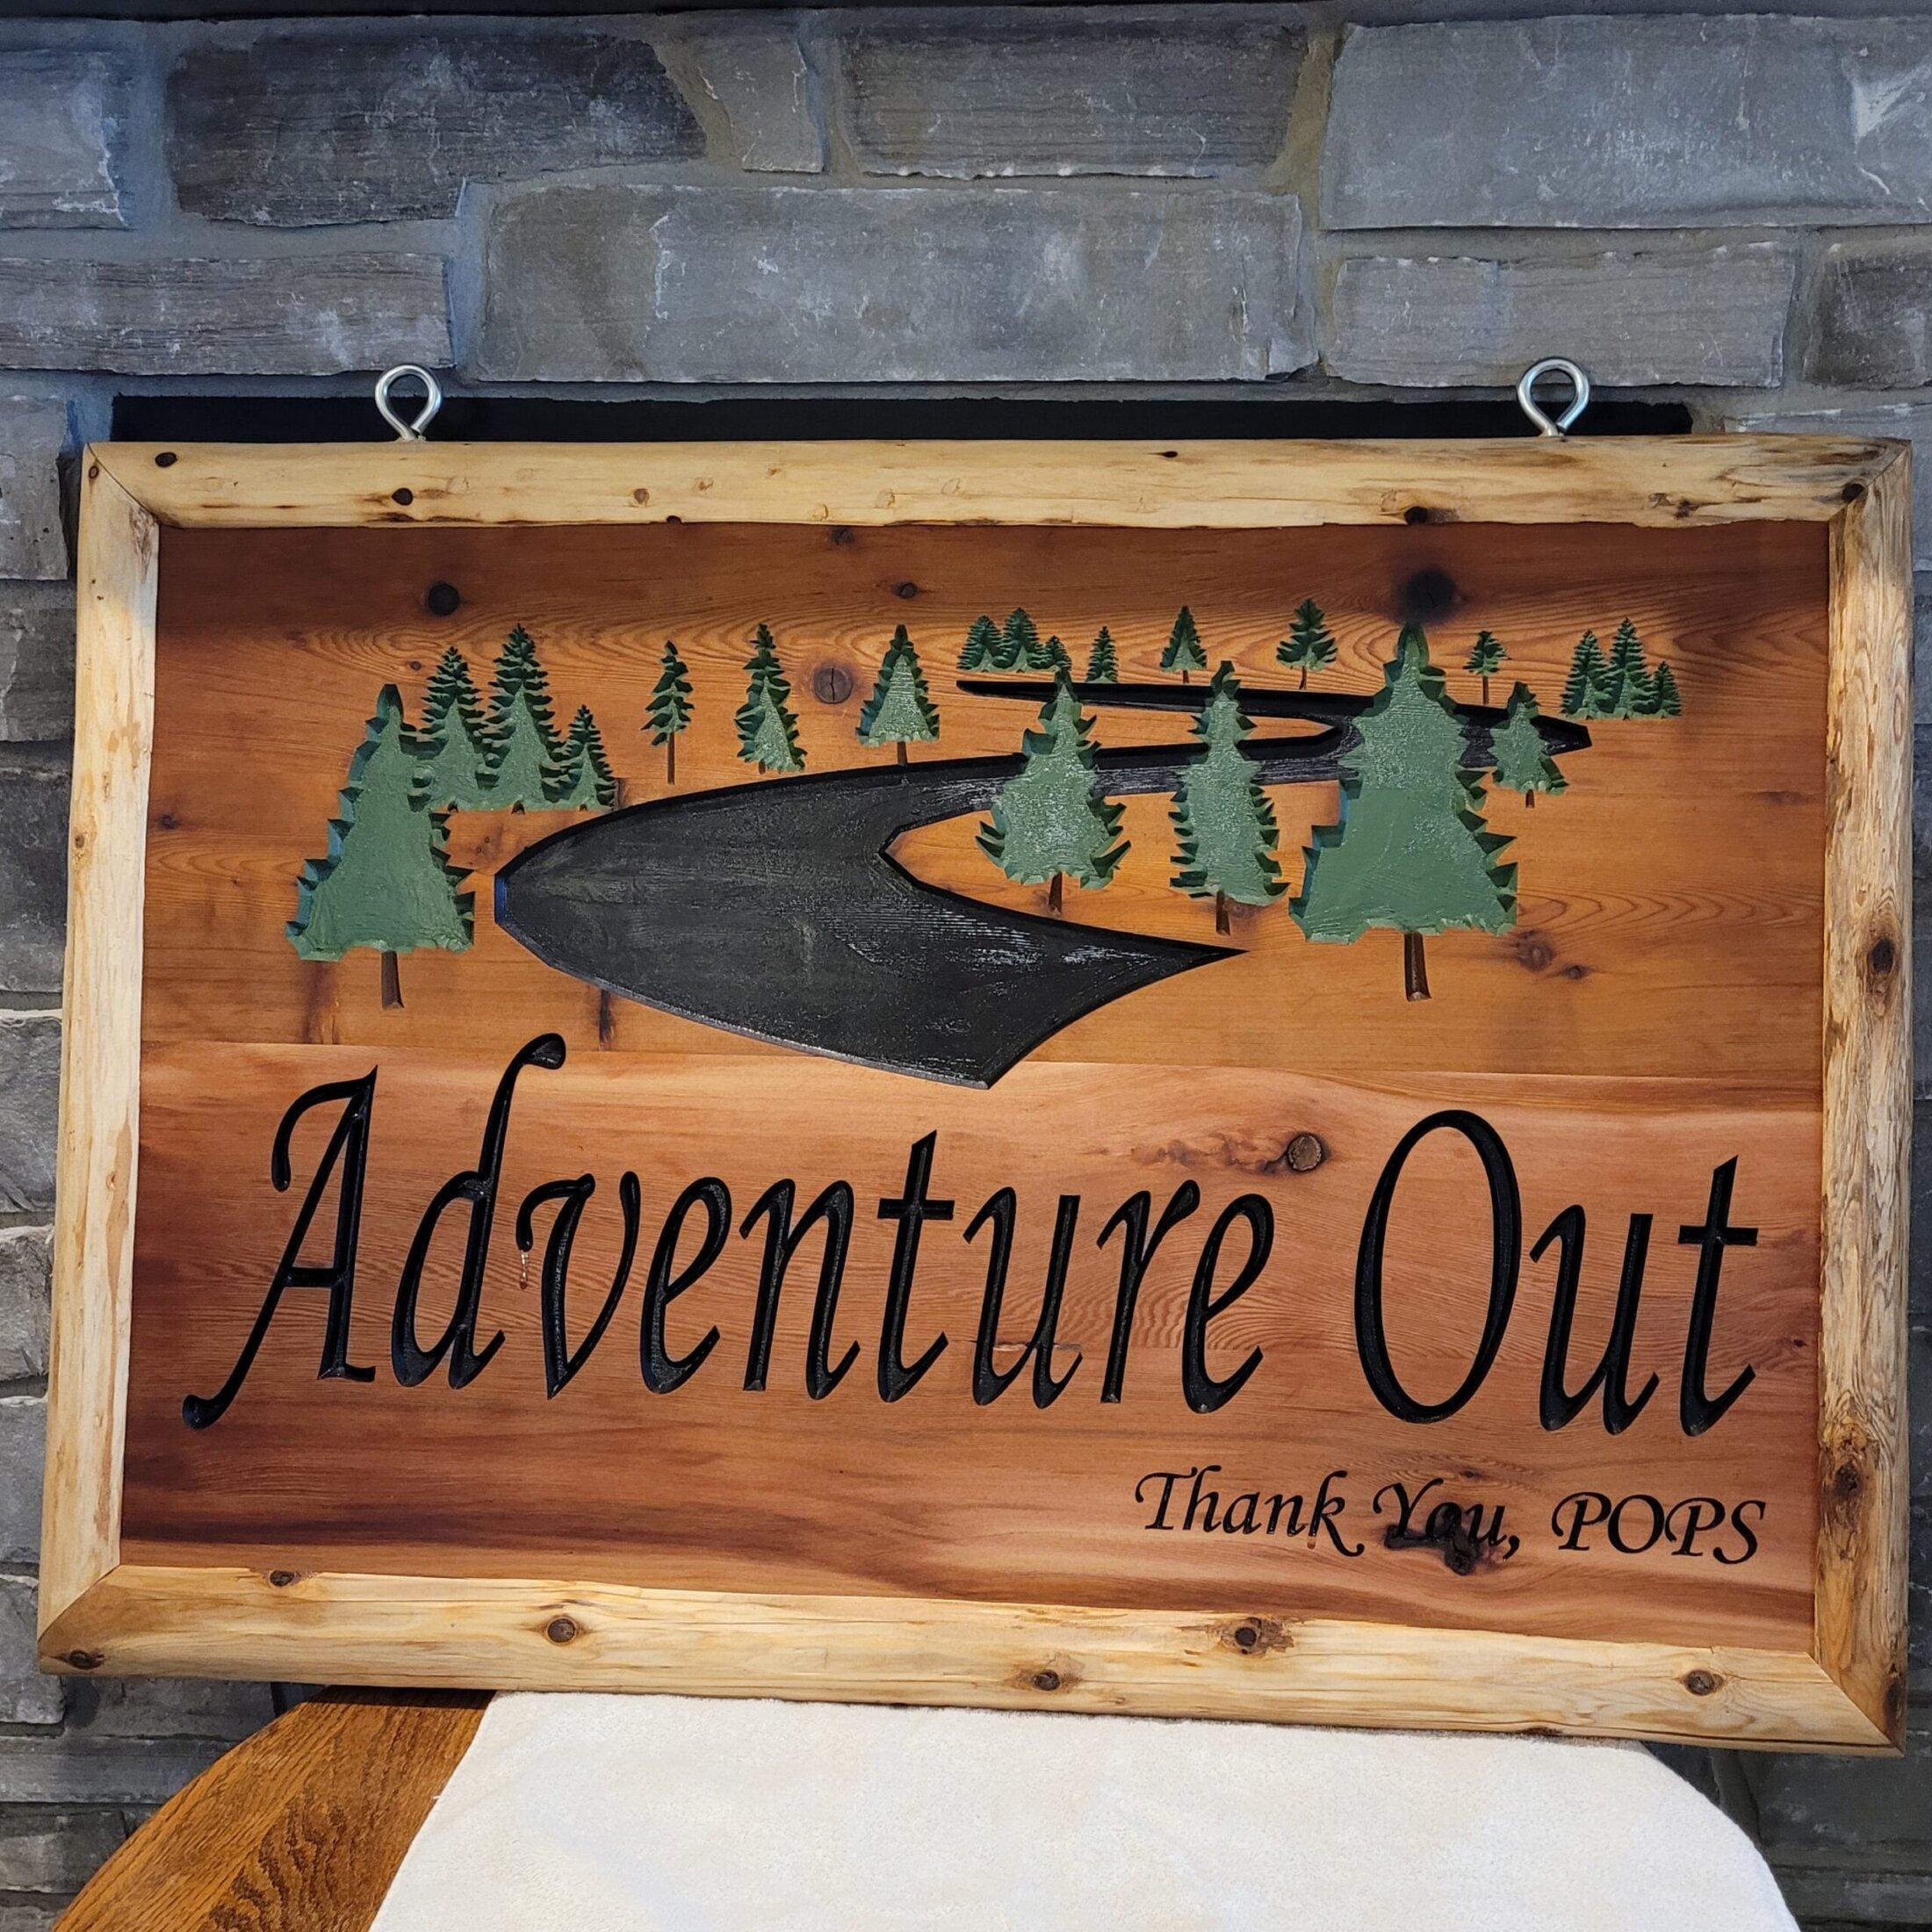 Custom Designed and Carved Cedar 2ft x 4ft Outdoor Sign with Log Frame